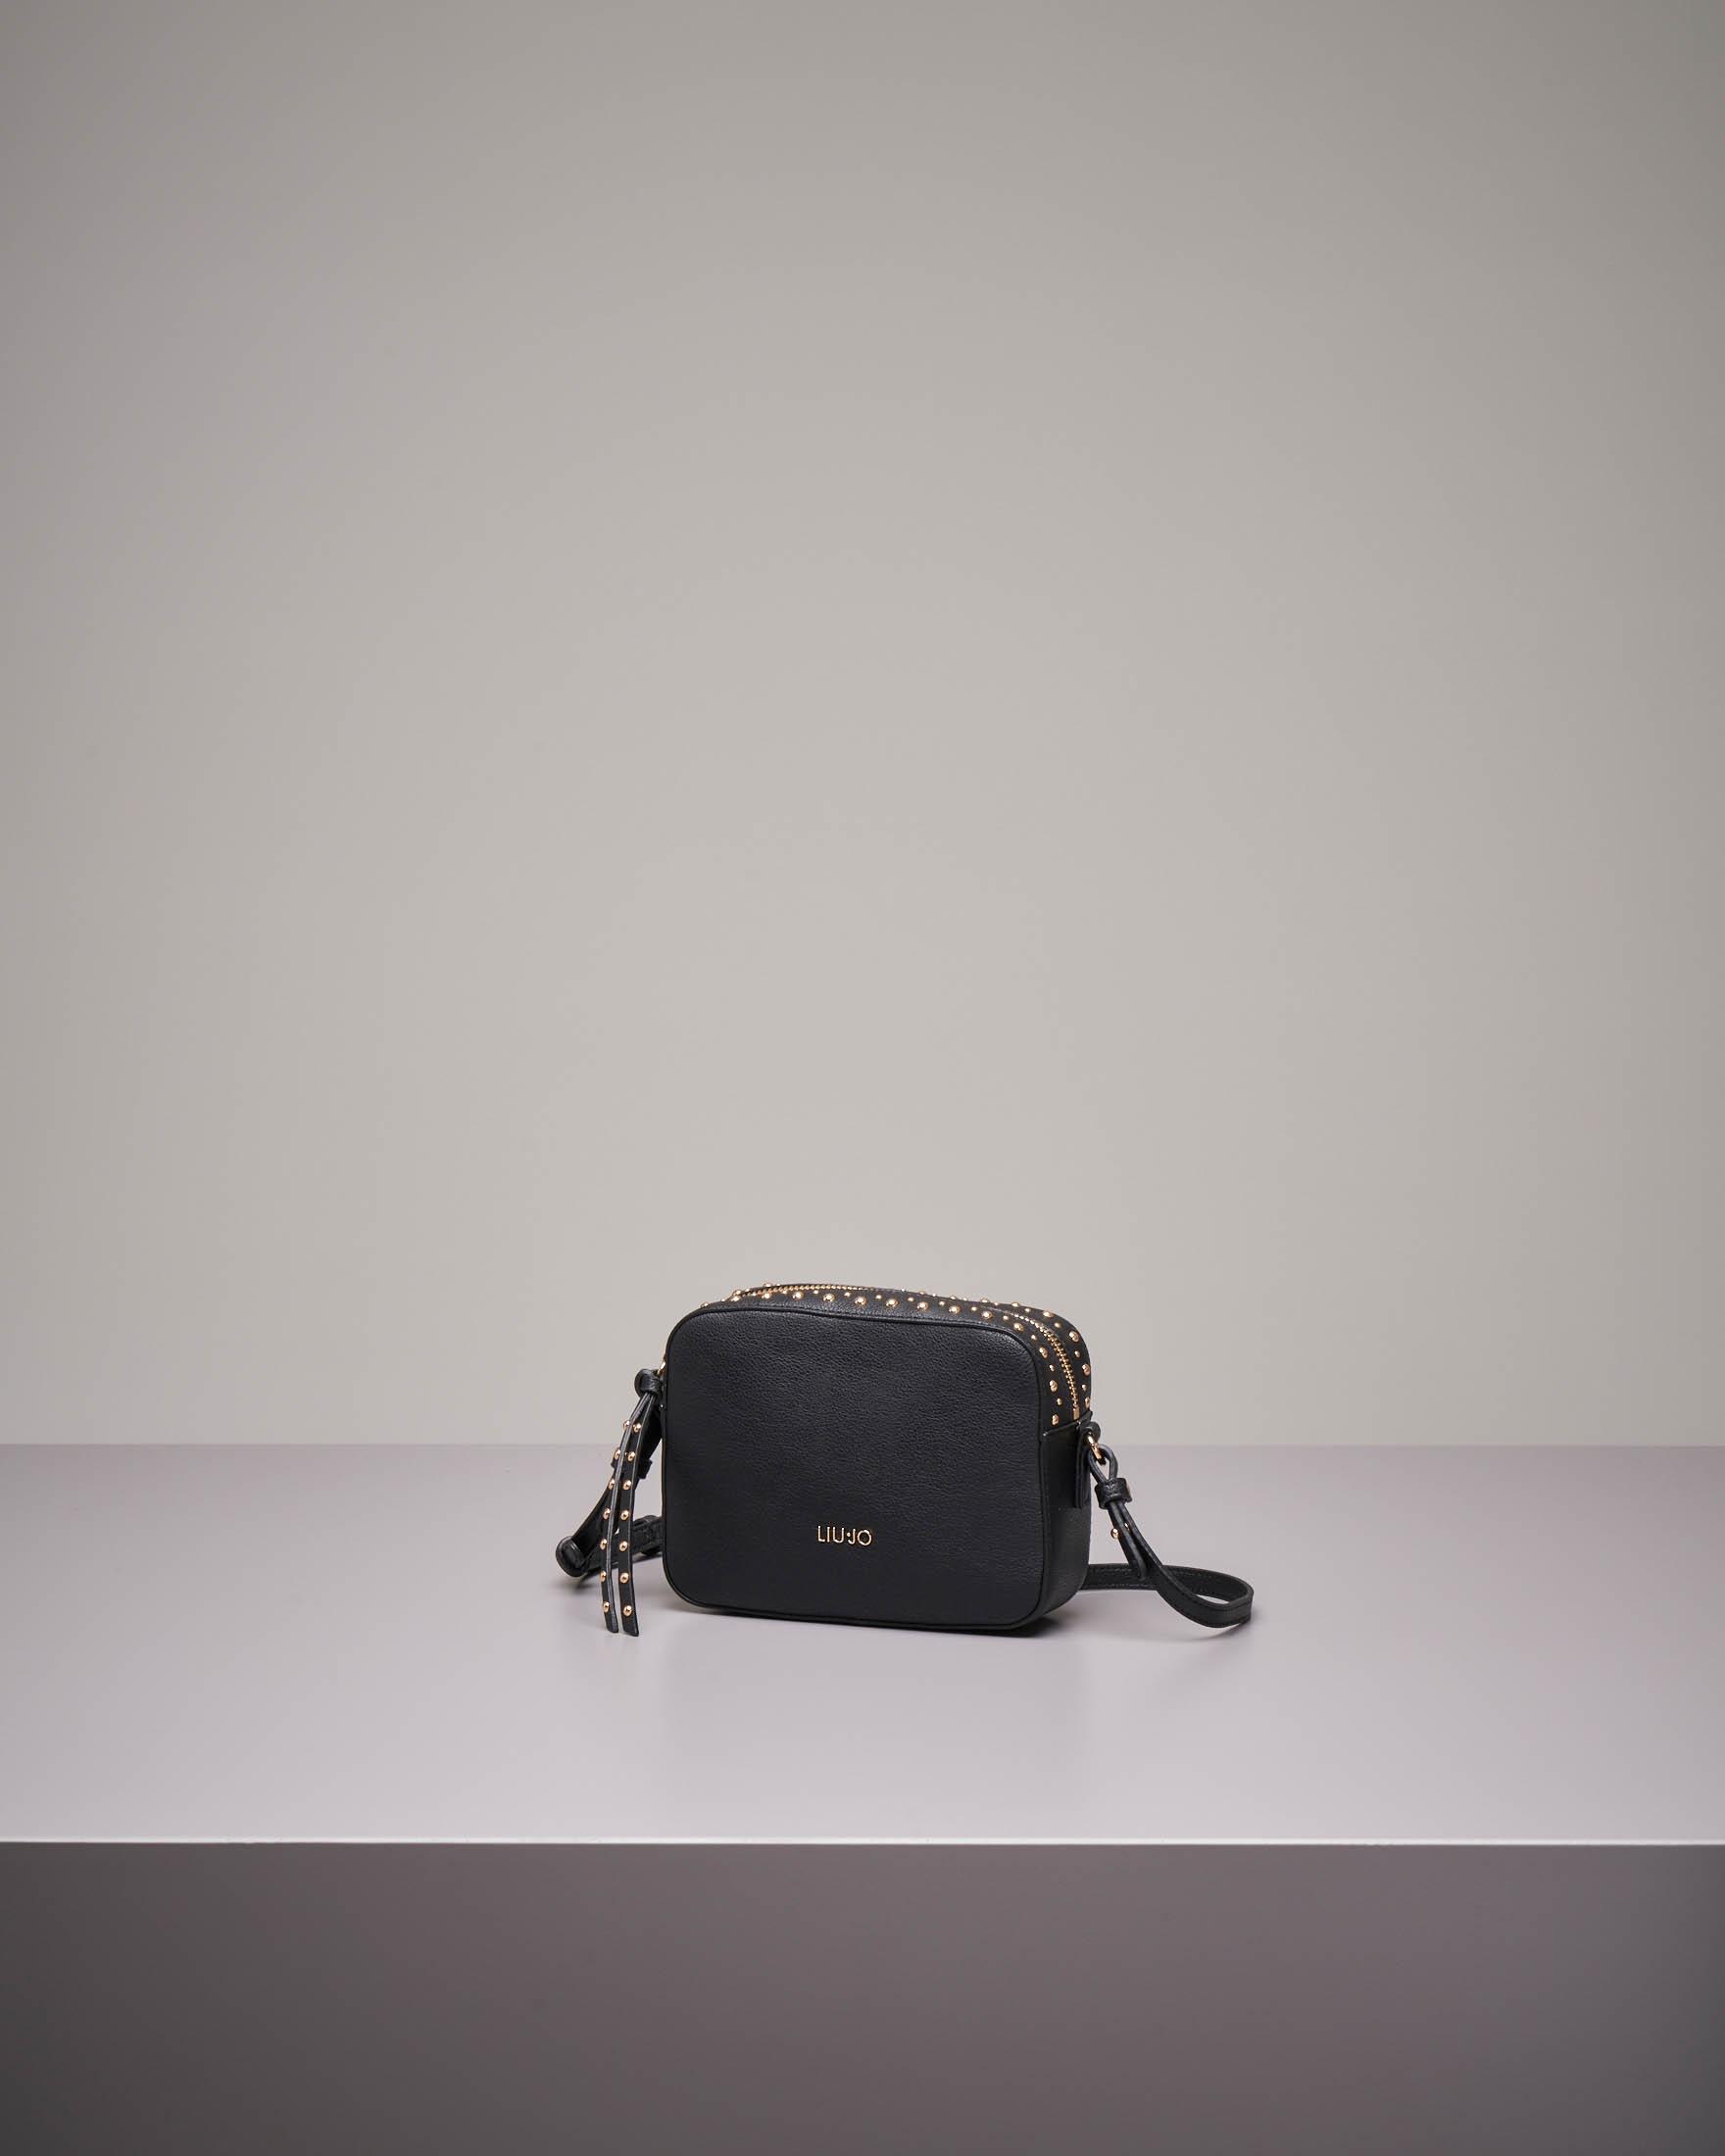 Cross bag nera in similpelle con borchie